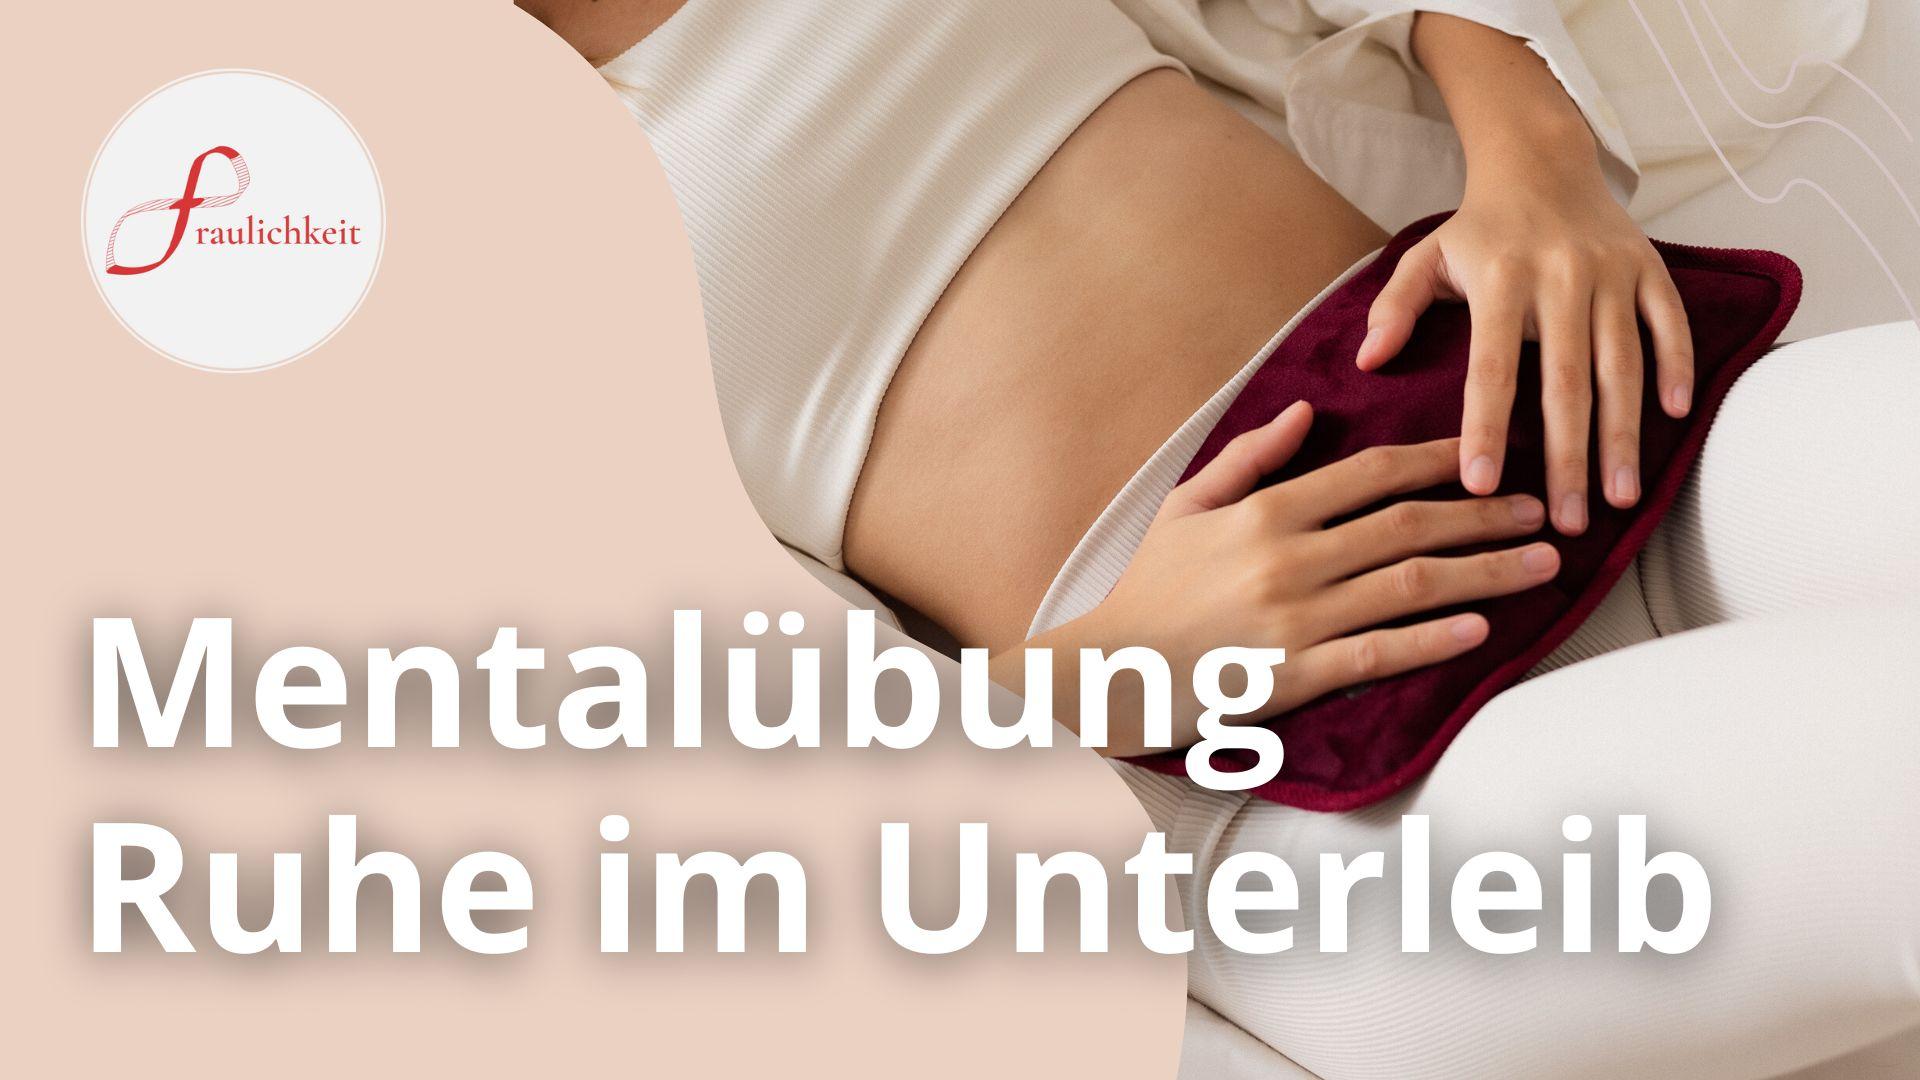 Meditation Frau Zyklus Schoß Fraulichkeit Youtube Anne Lippold